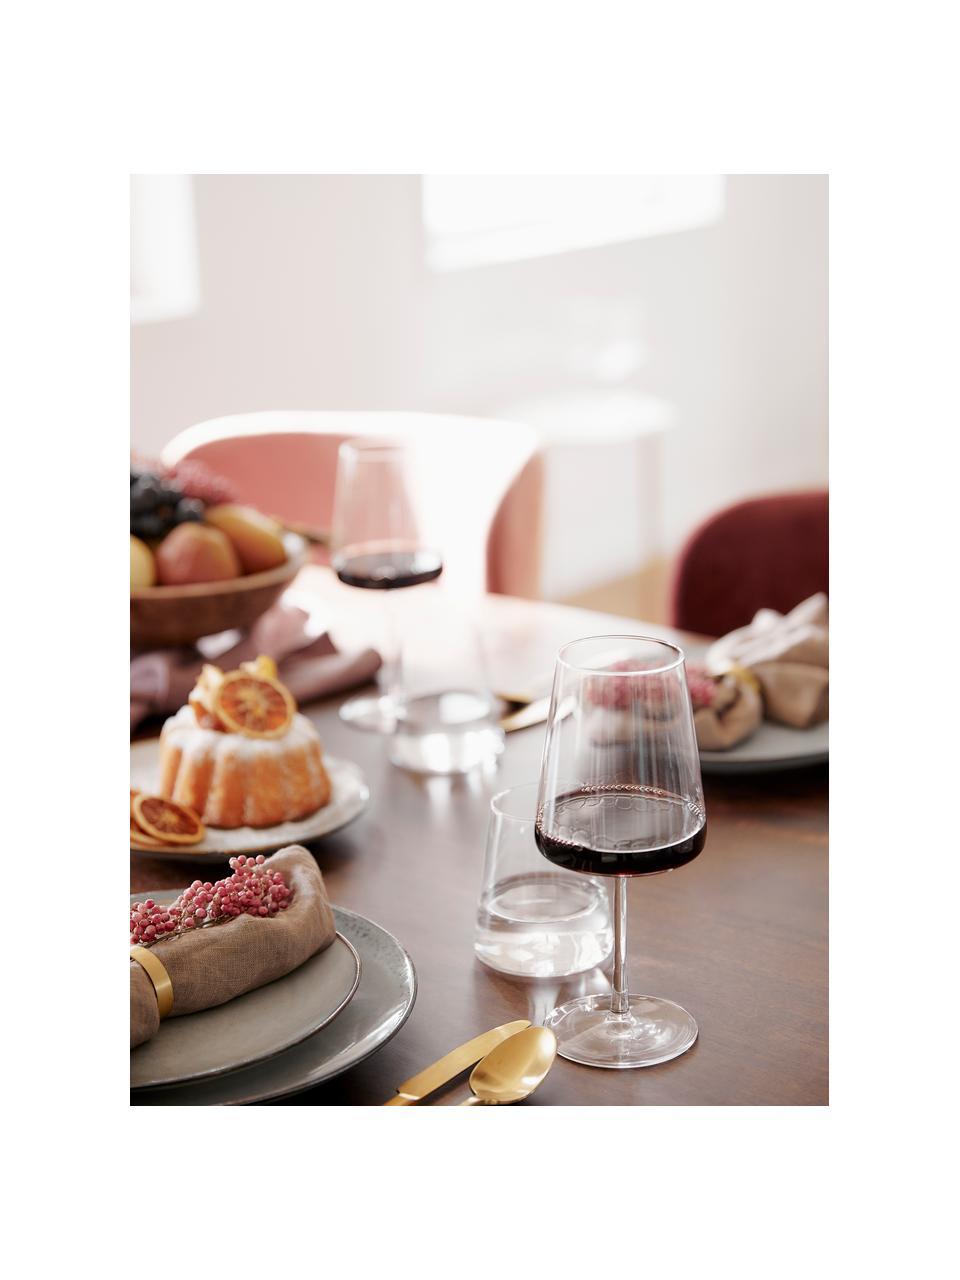 Rode wijnglazen Power in kegelvorm, 6 stuks, Kristalglas, Transparant, Ø 9 x H 23 cm